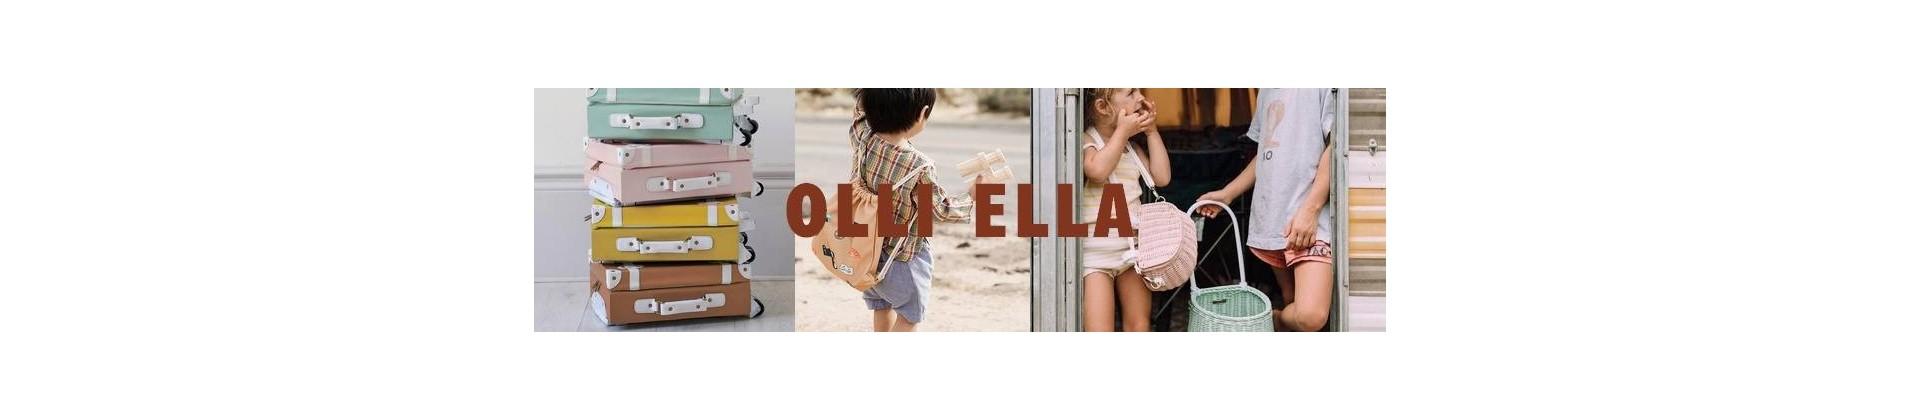 Olli Ella sale